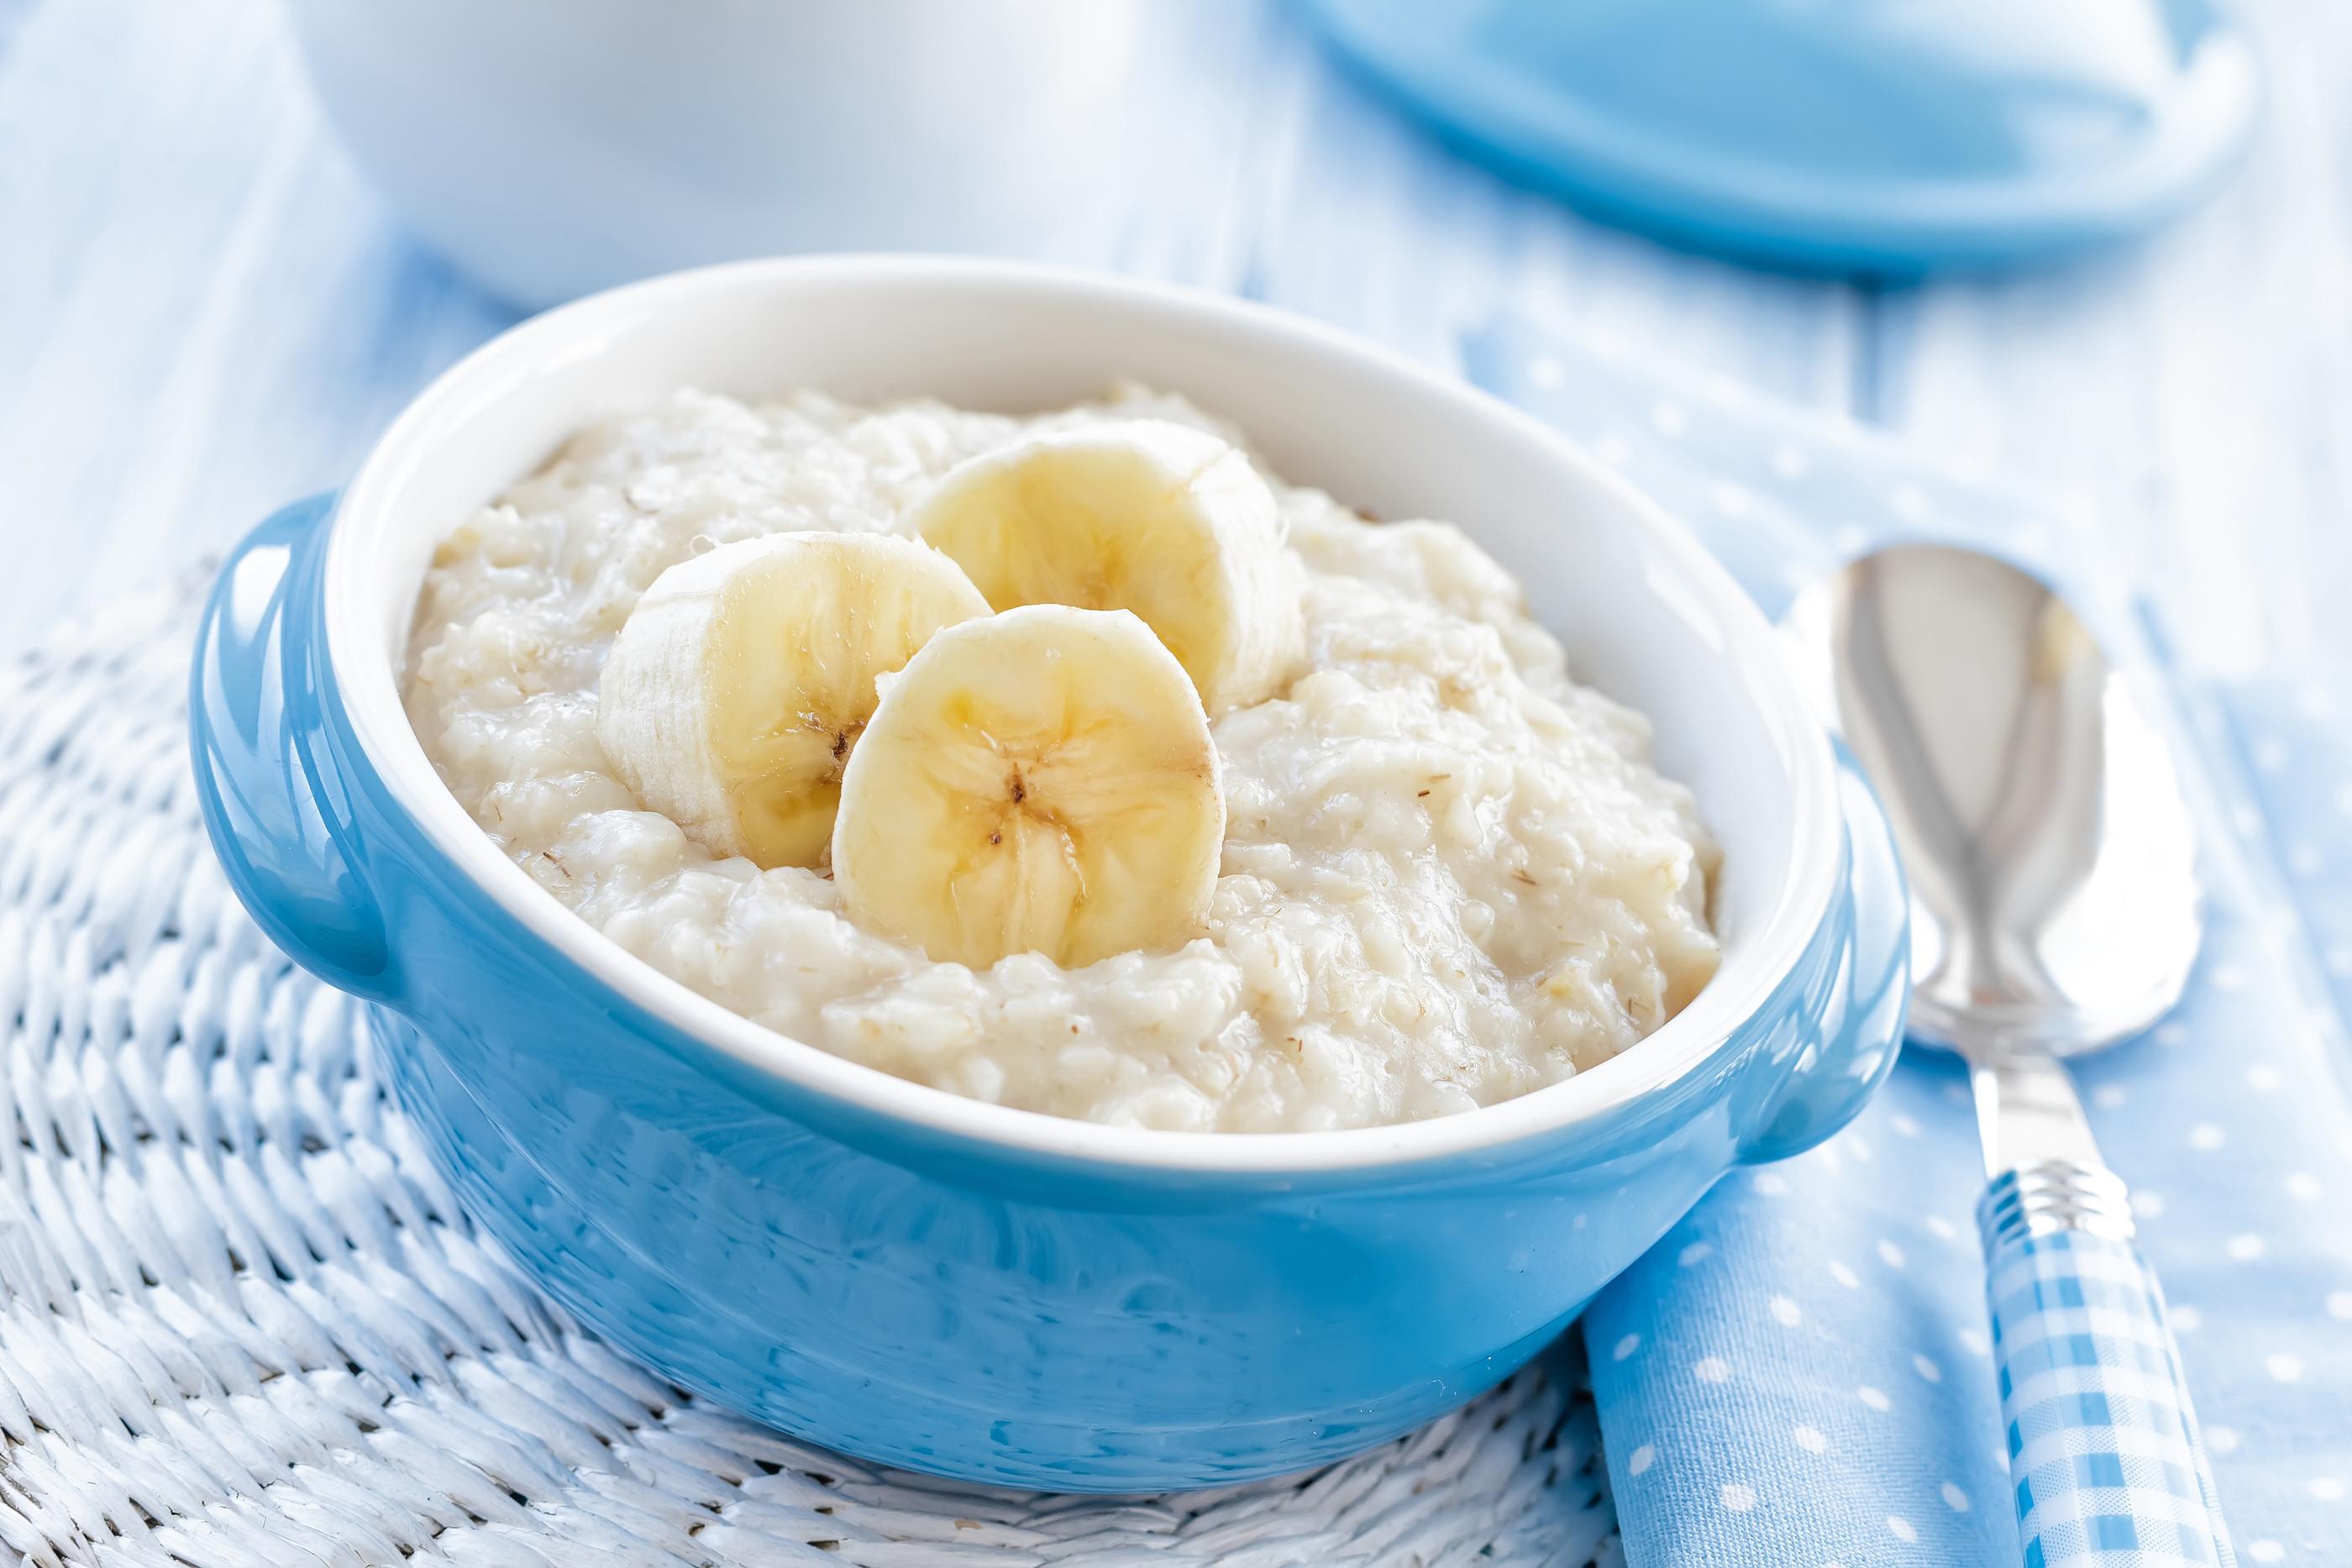 bigstock-Oatmeal-with-banana-59029136